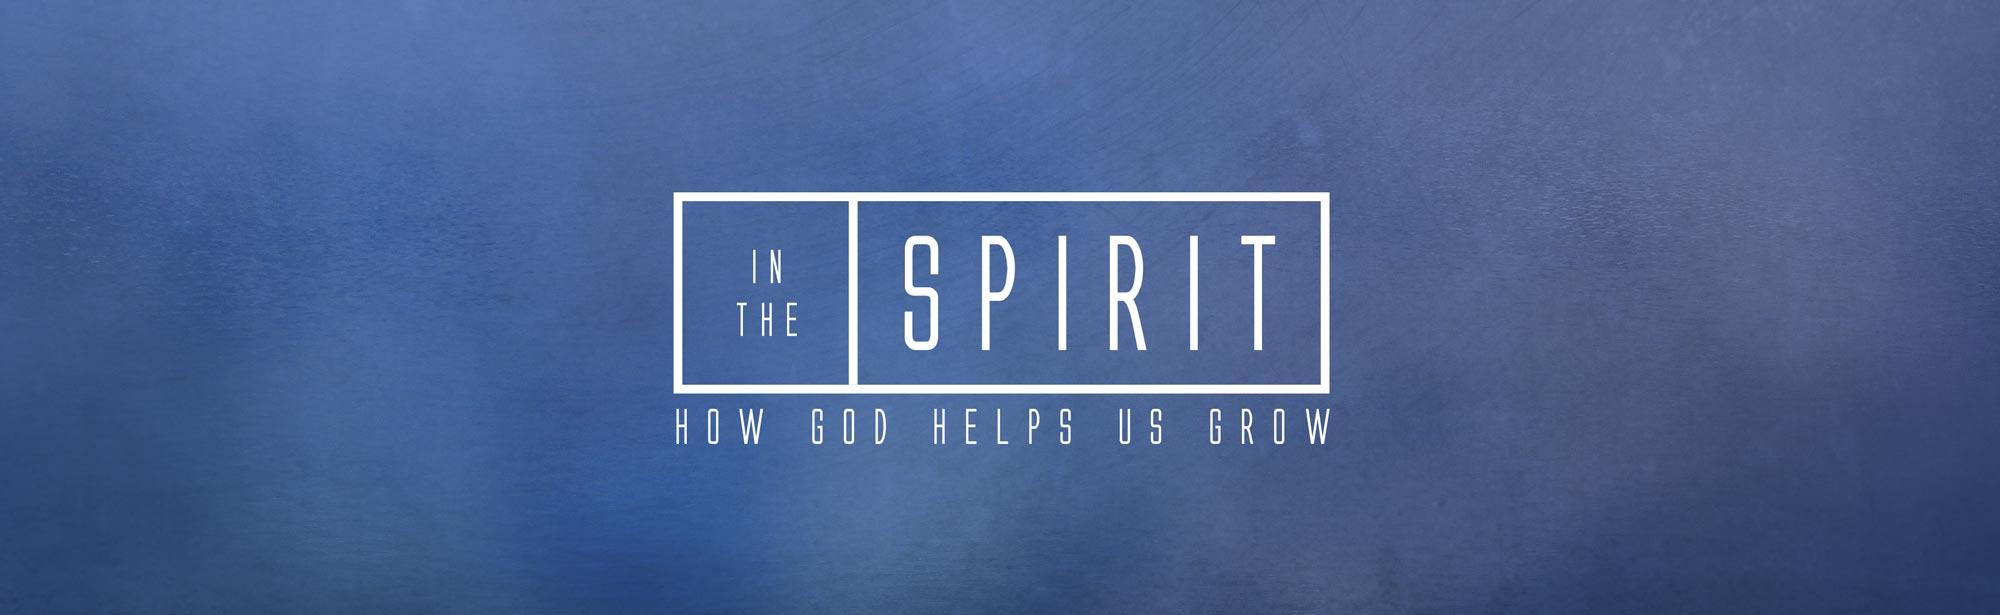 In the Spirit: How God Helps Us Grow - Grace Community Church